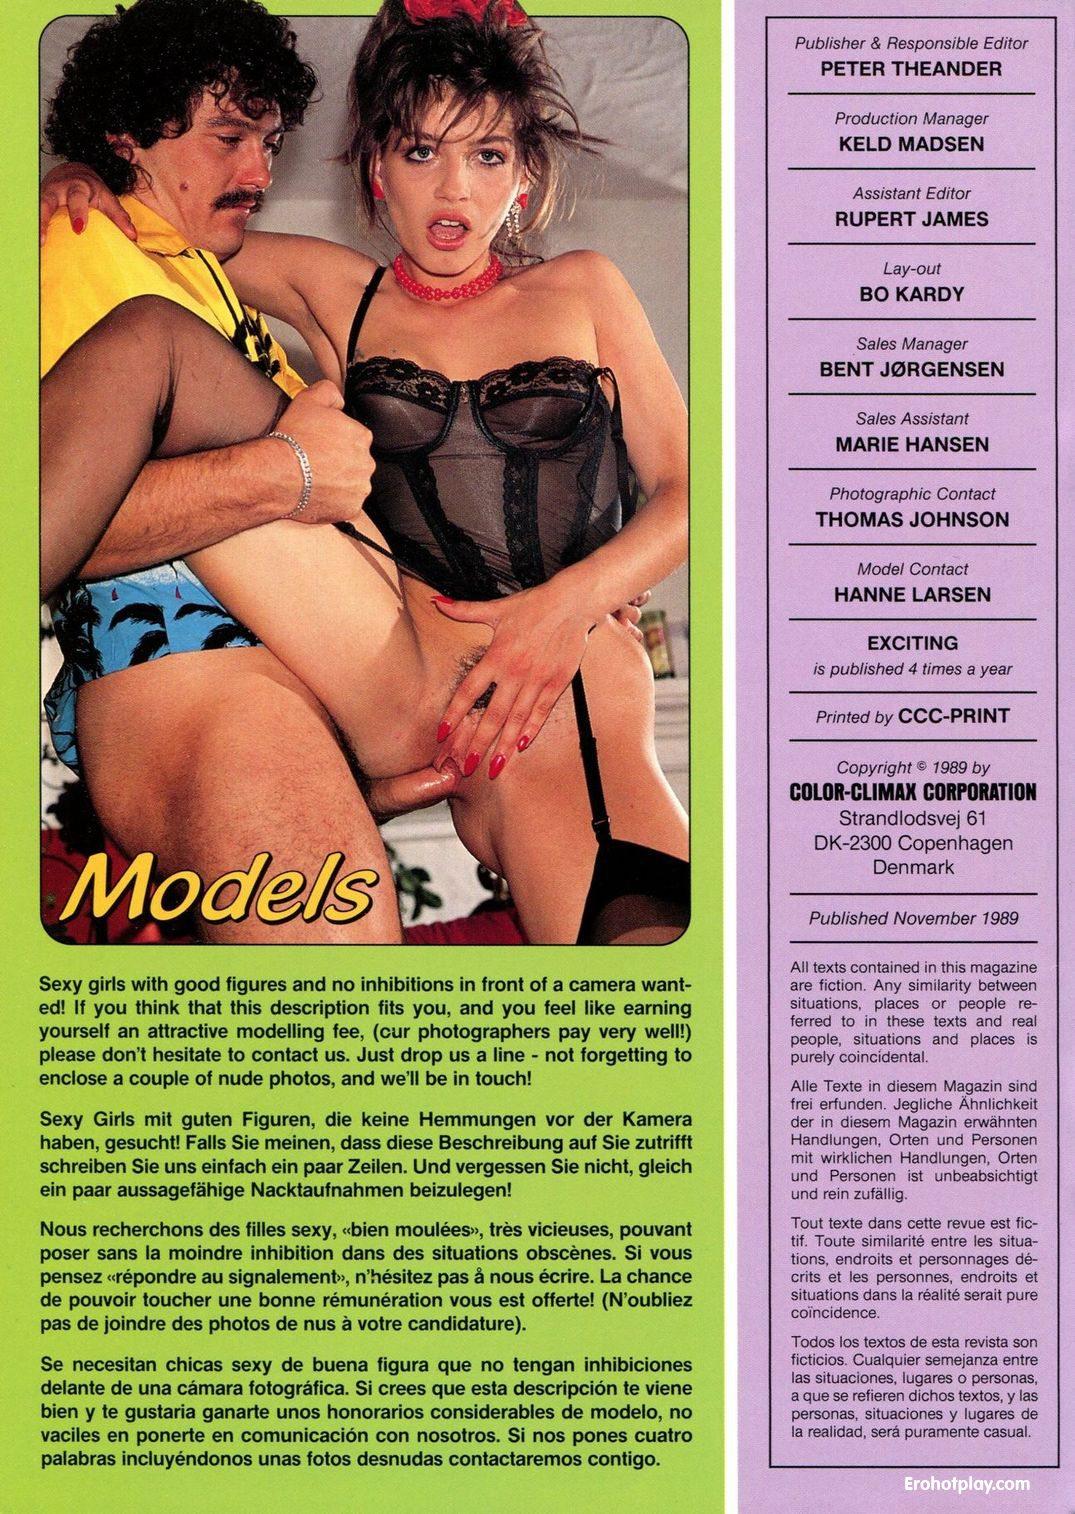 Порно журнал еще фото фото 691-40